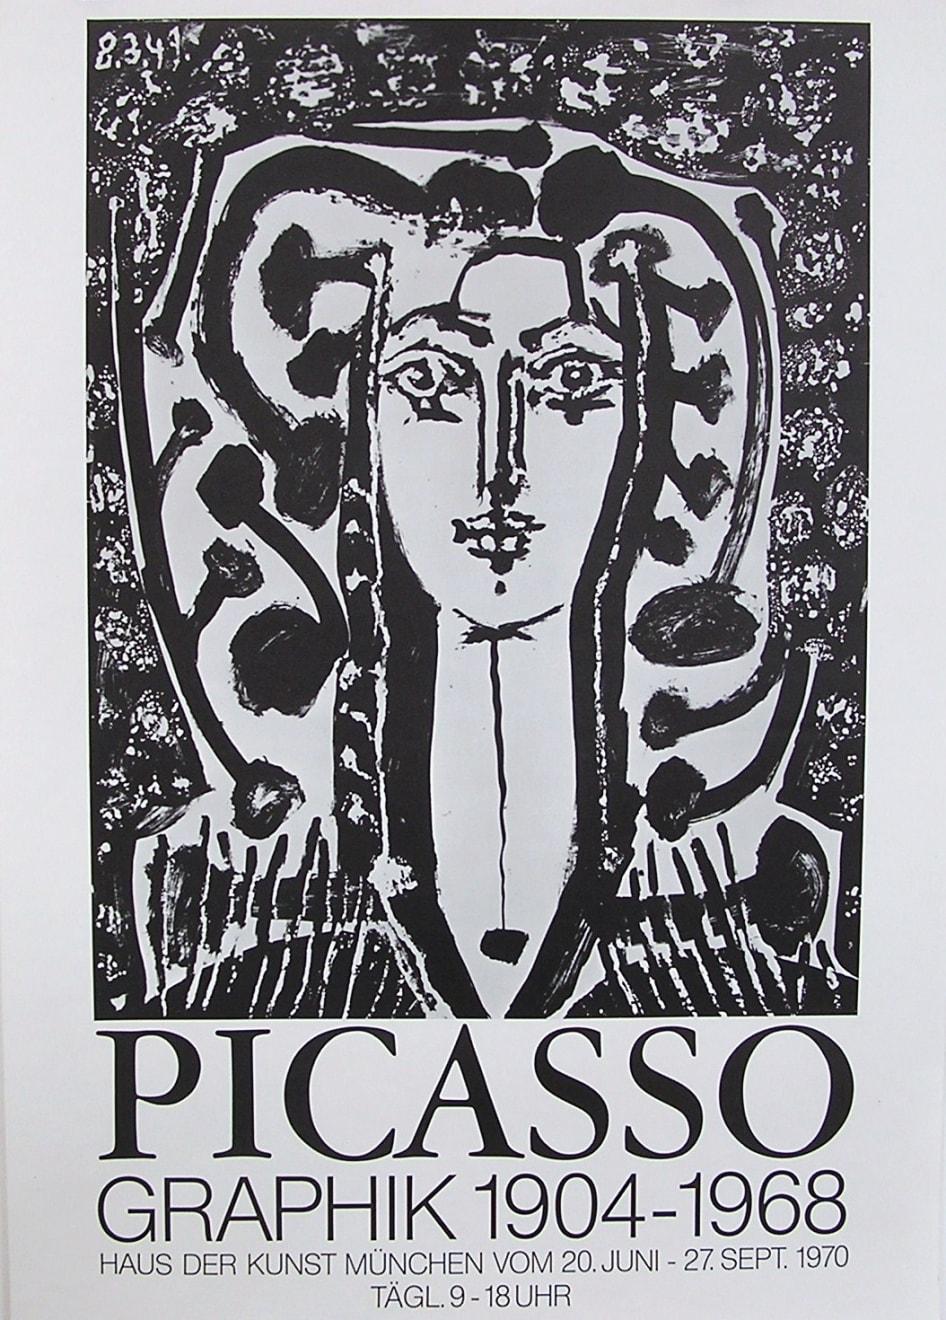 Pablo Picasso, Picasso 'Graphik 1904 - 1968' Exhibition Poster, 1970